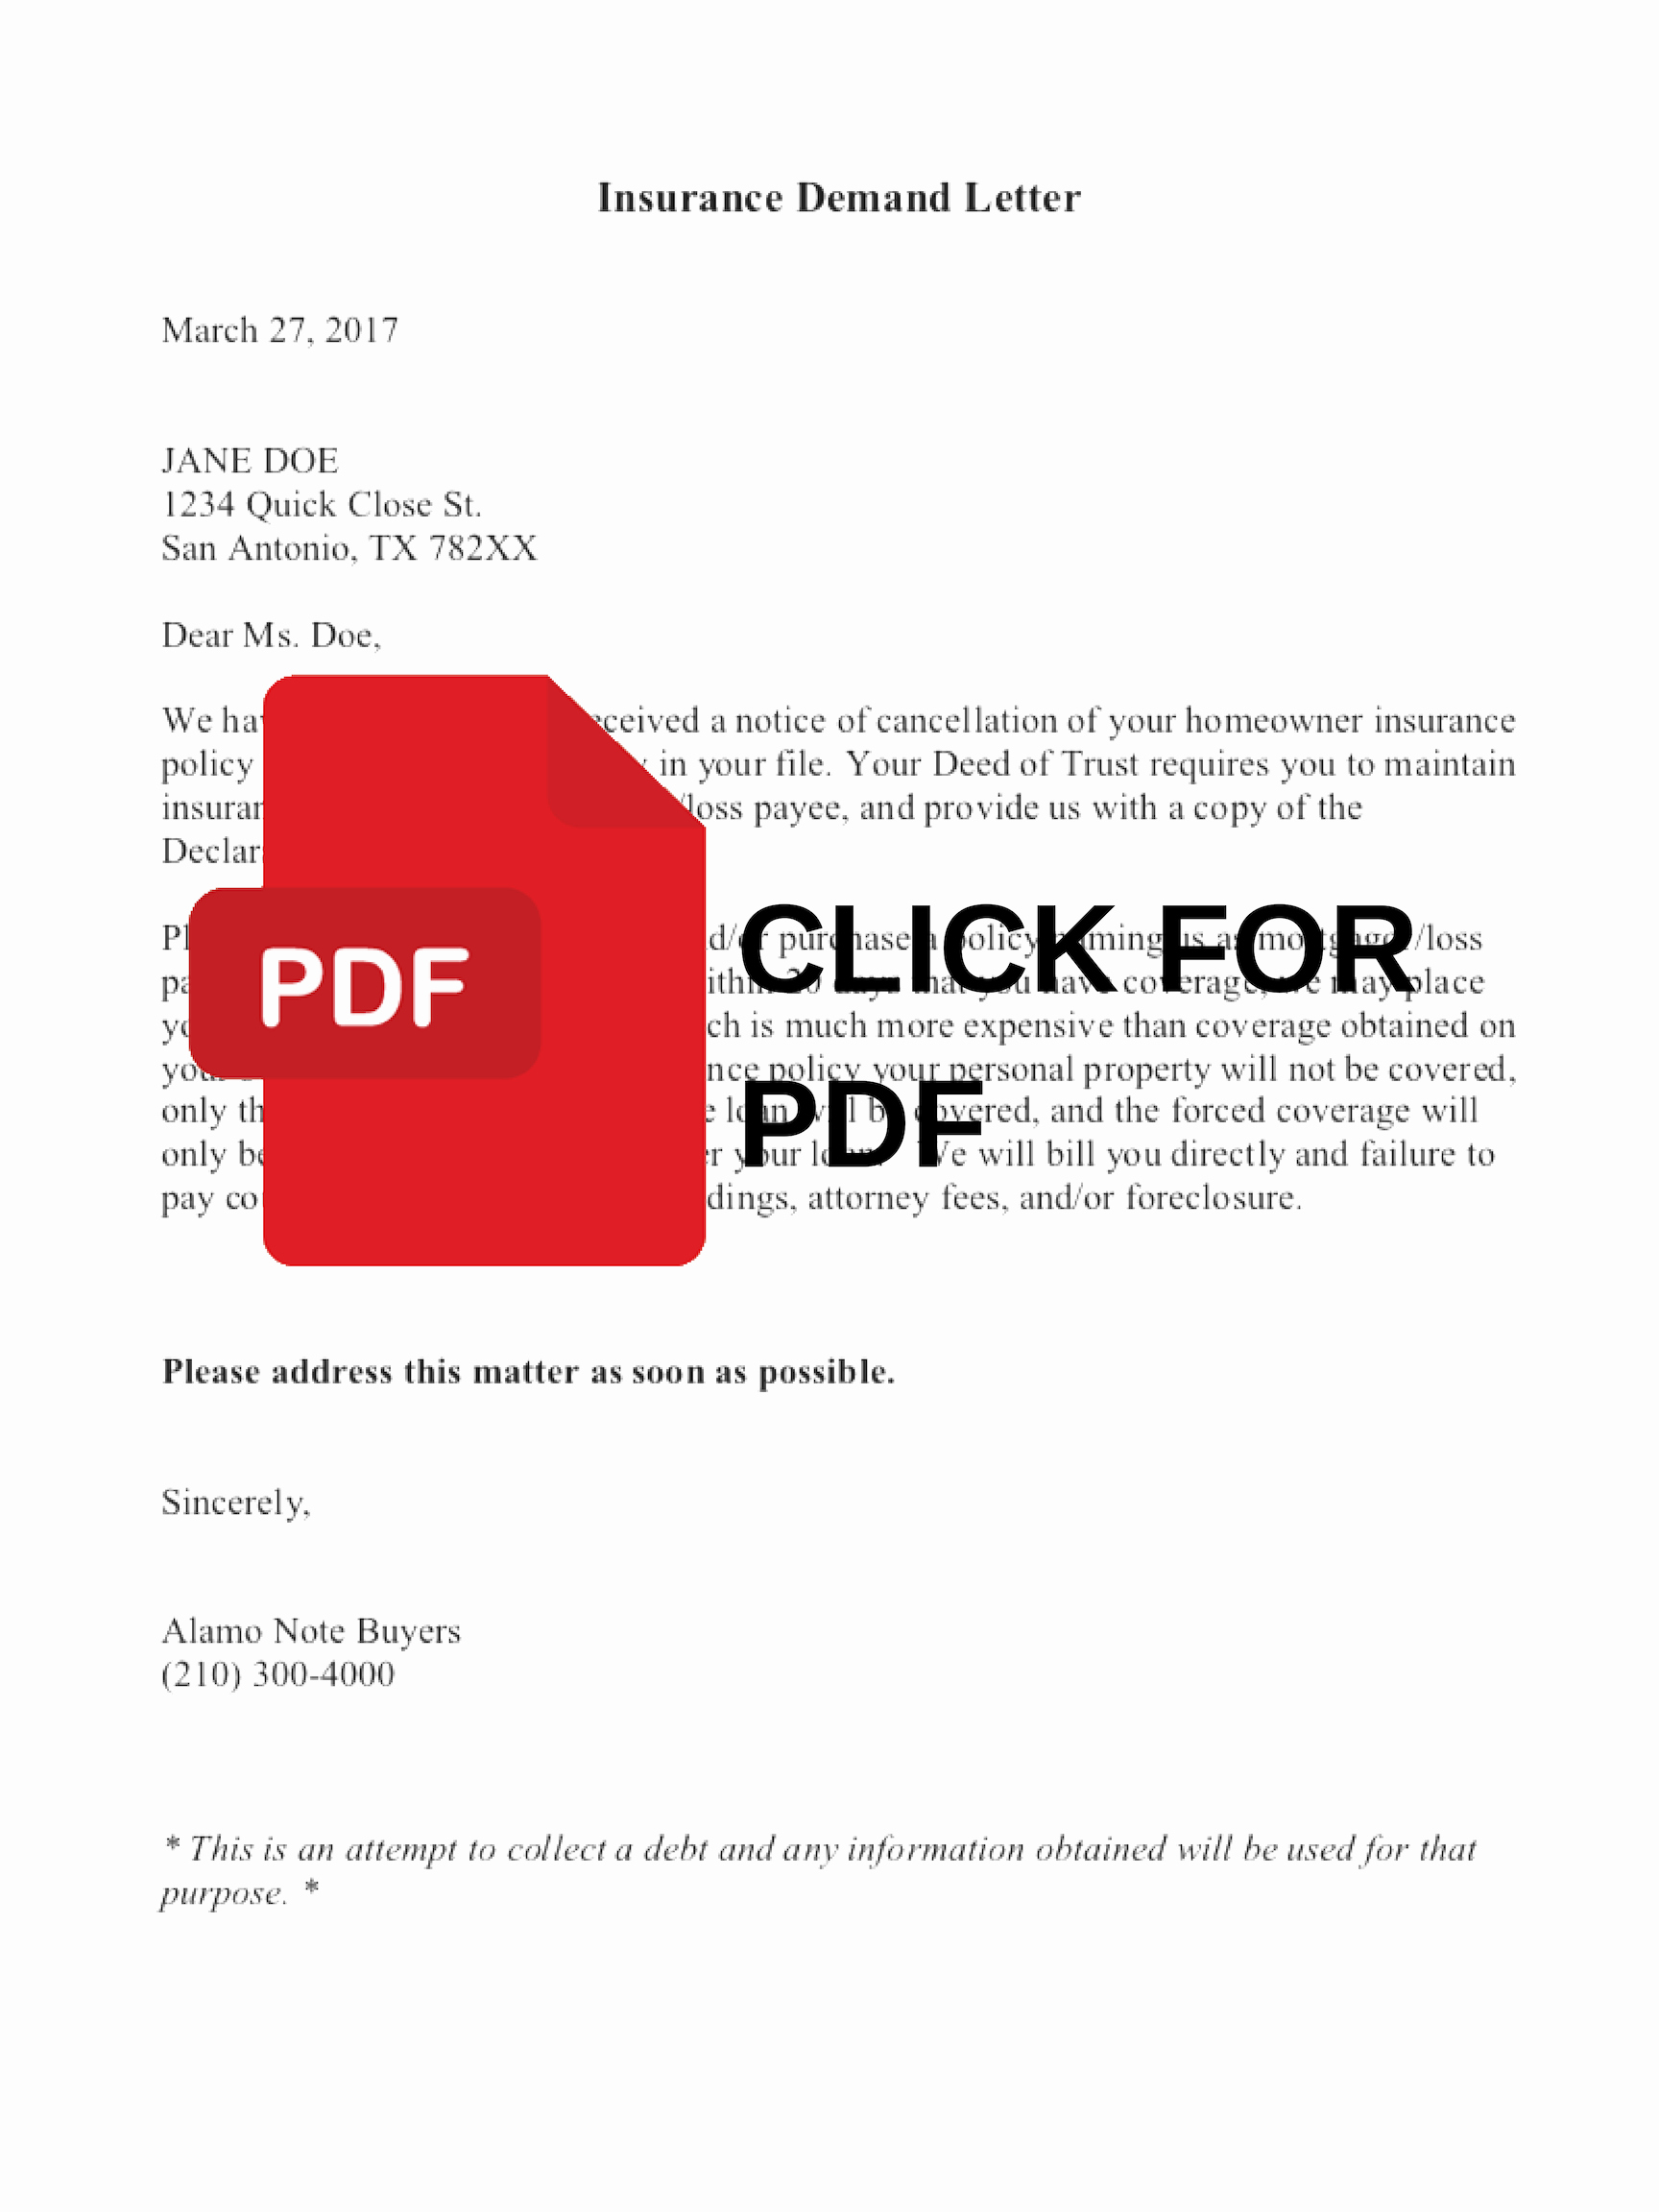 Insurance Demand Letter Beautiful Insurance Demand Letter Alamo Note Buyers